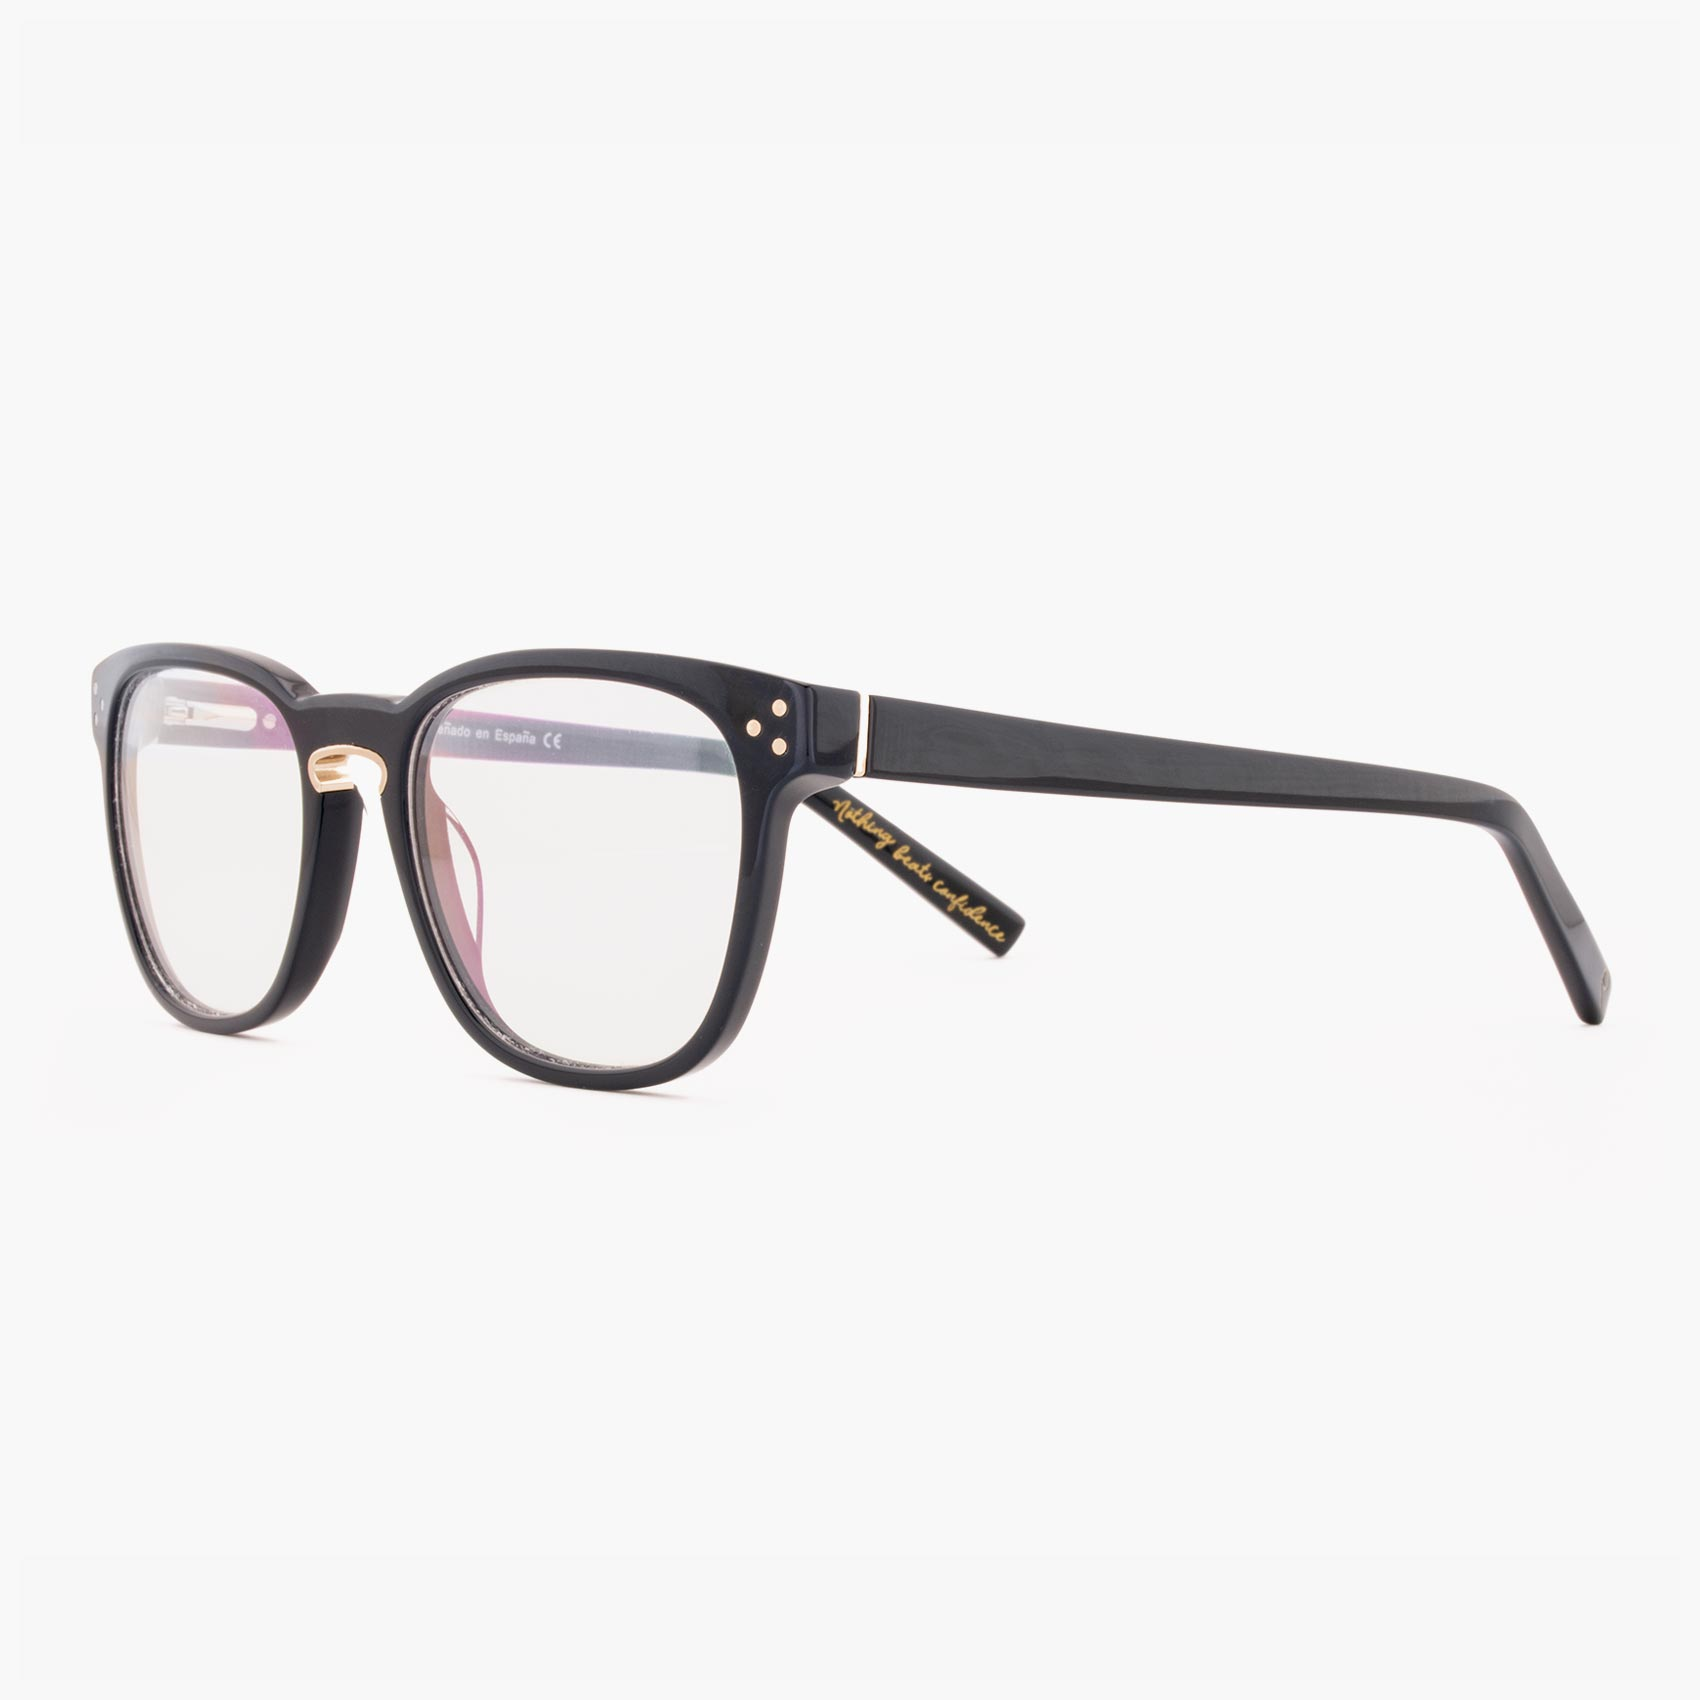 Proud eyewear Firth C3 L montura gafas acetato azul oscuro